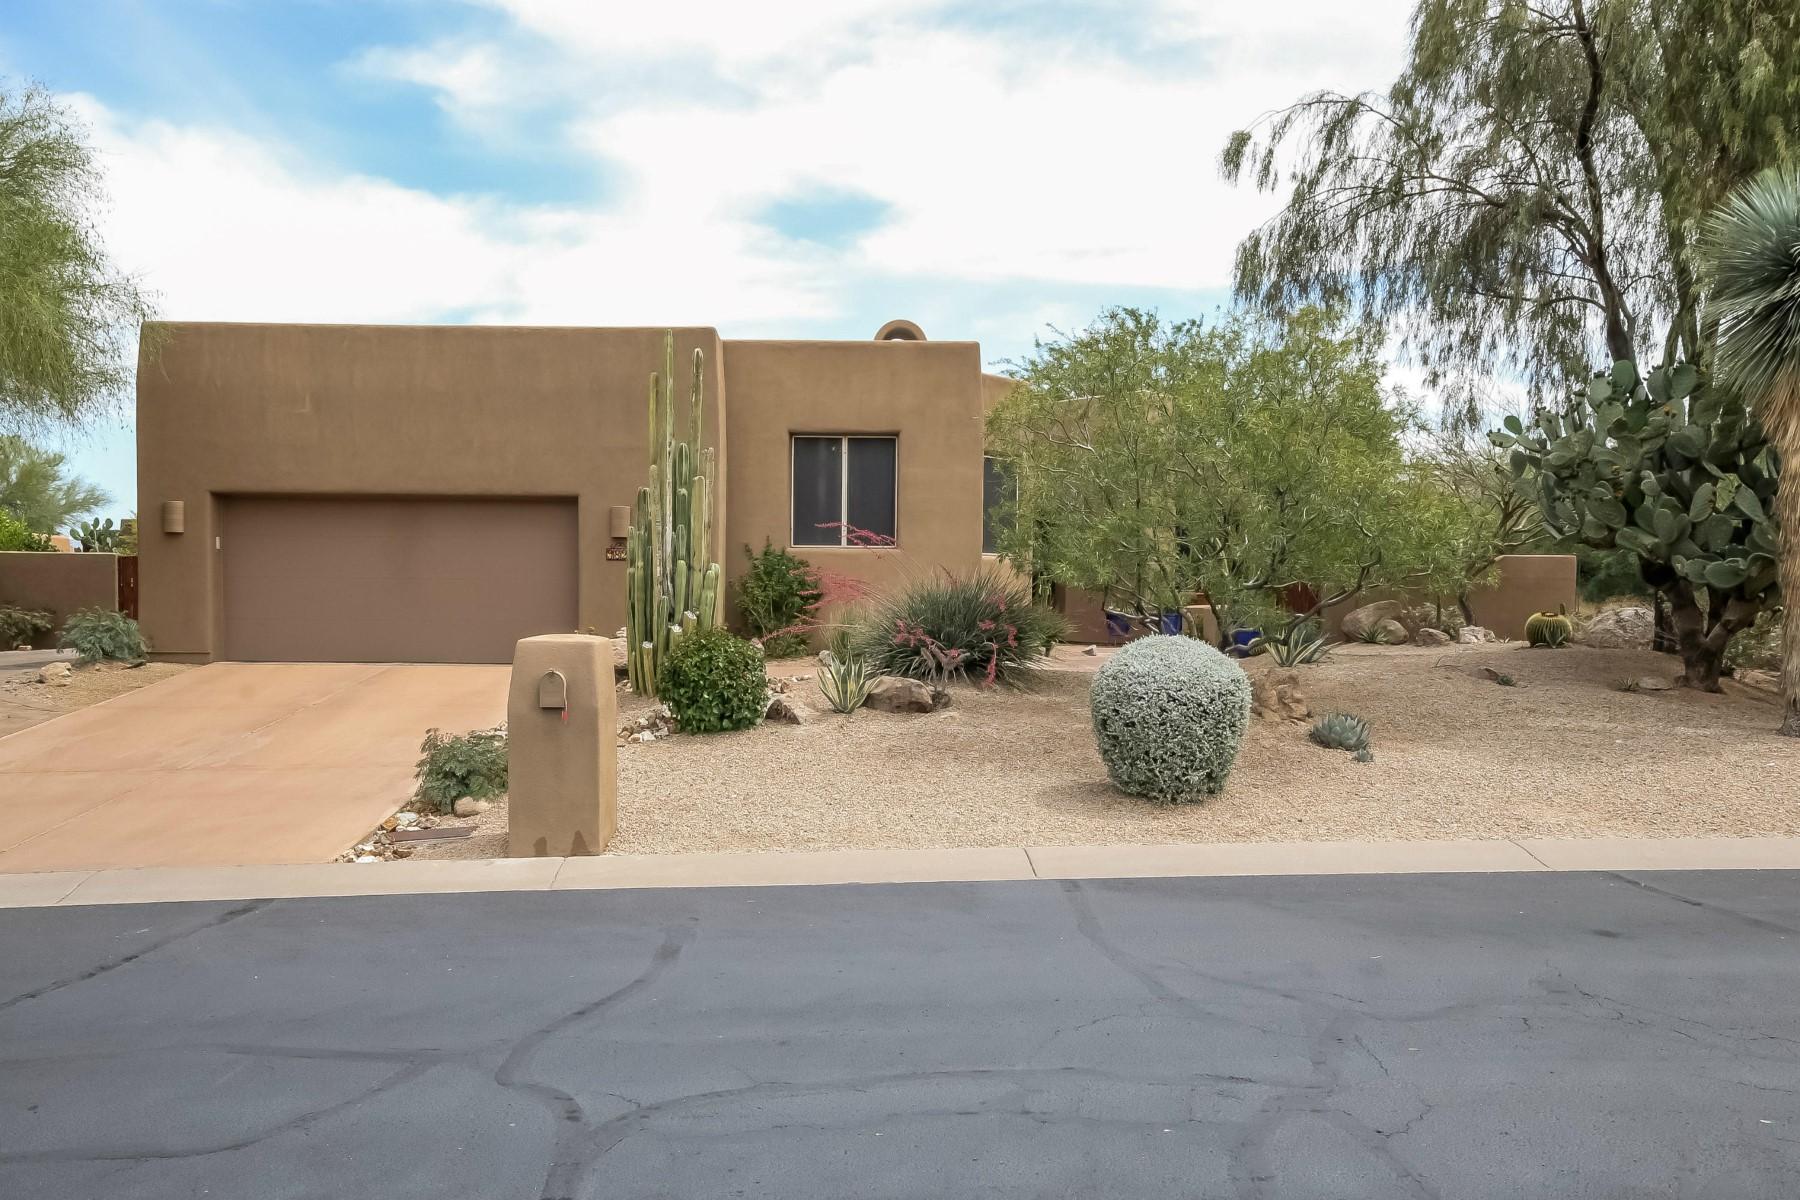 Casa para uma família para Venda às Beautiful setting in The Monument, with privacy and views 9828 E GAMBLE LN Scottsdale, Arizona 85262 Estados Unidos